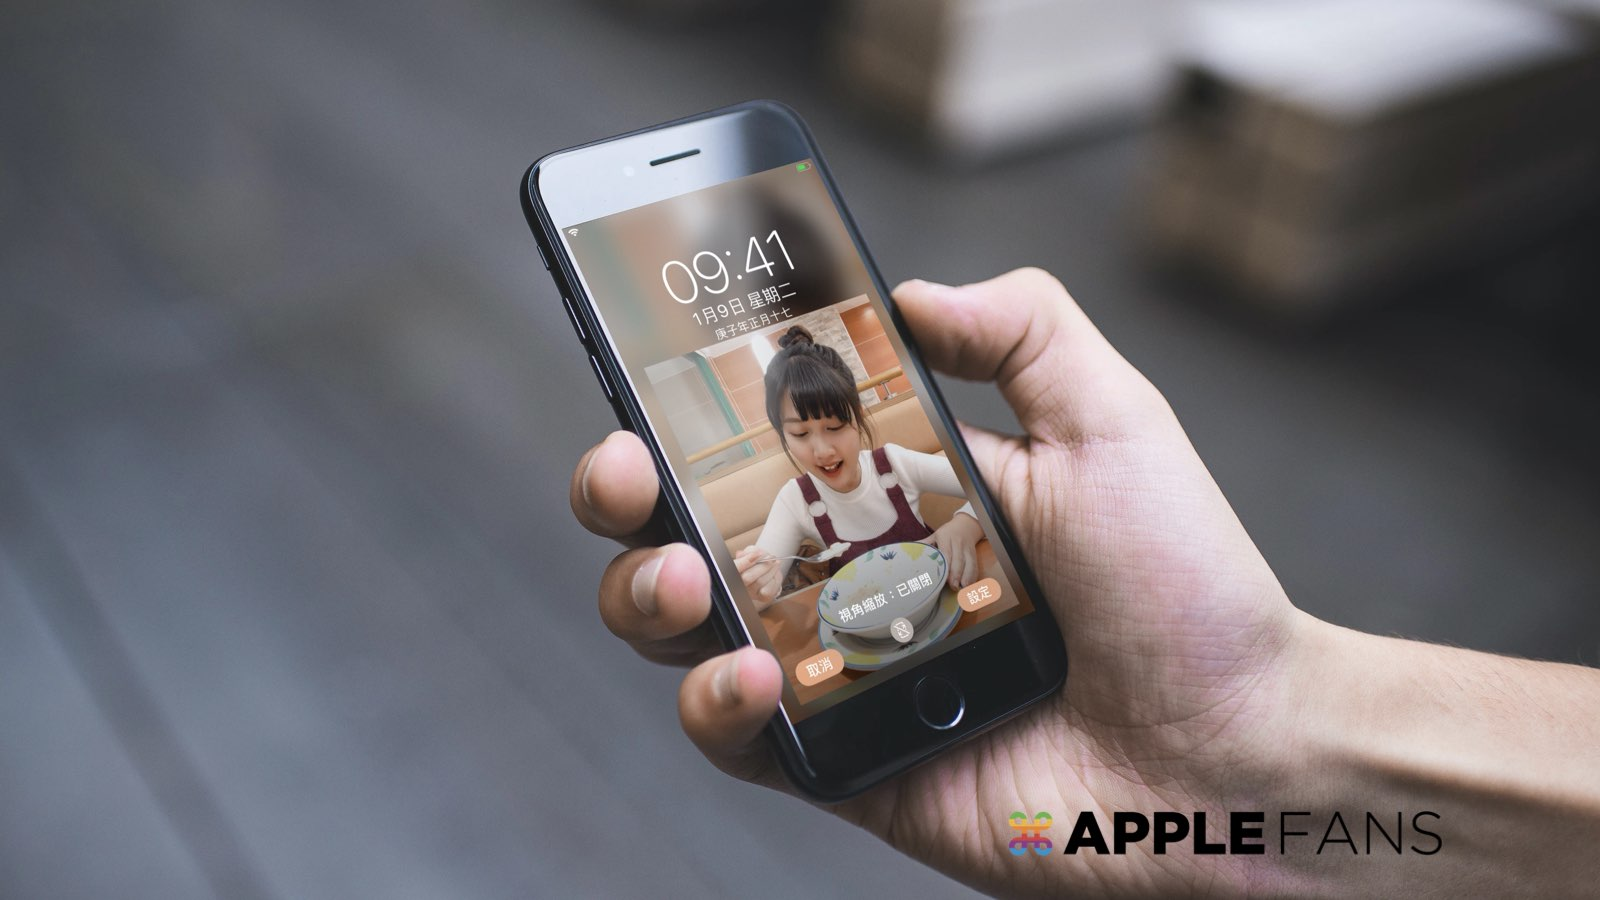 Iphone 桌布擋臉完美解決方法 附圖教學 Applefans 蘋果迷